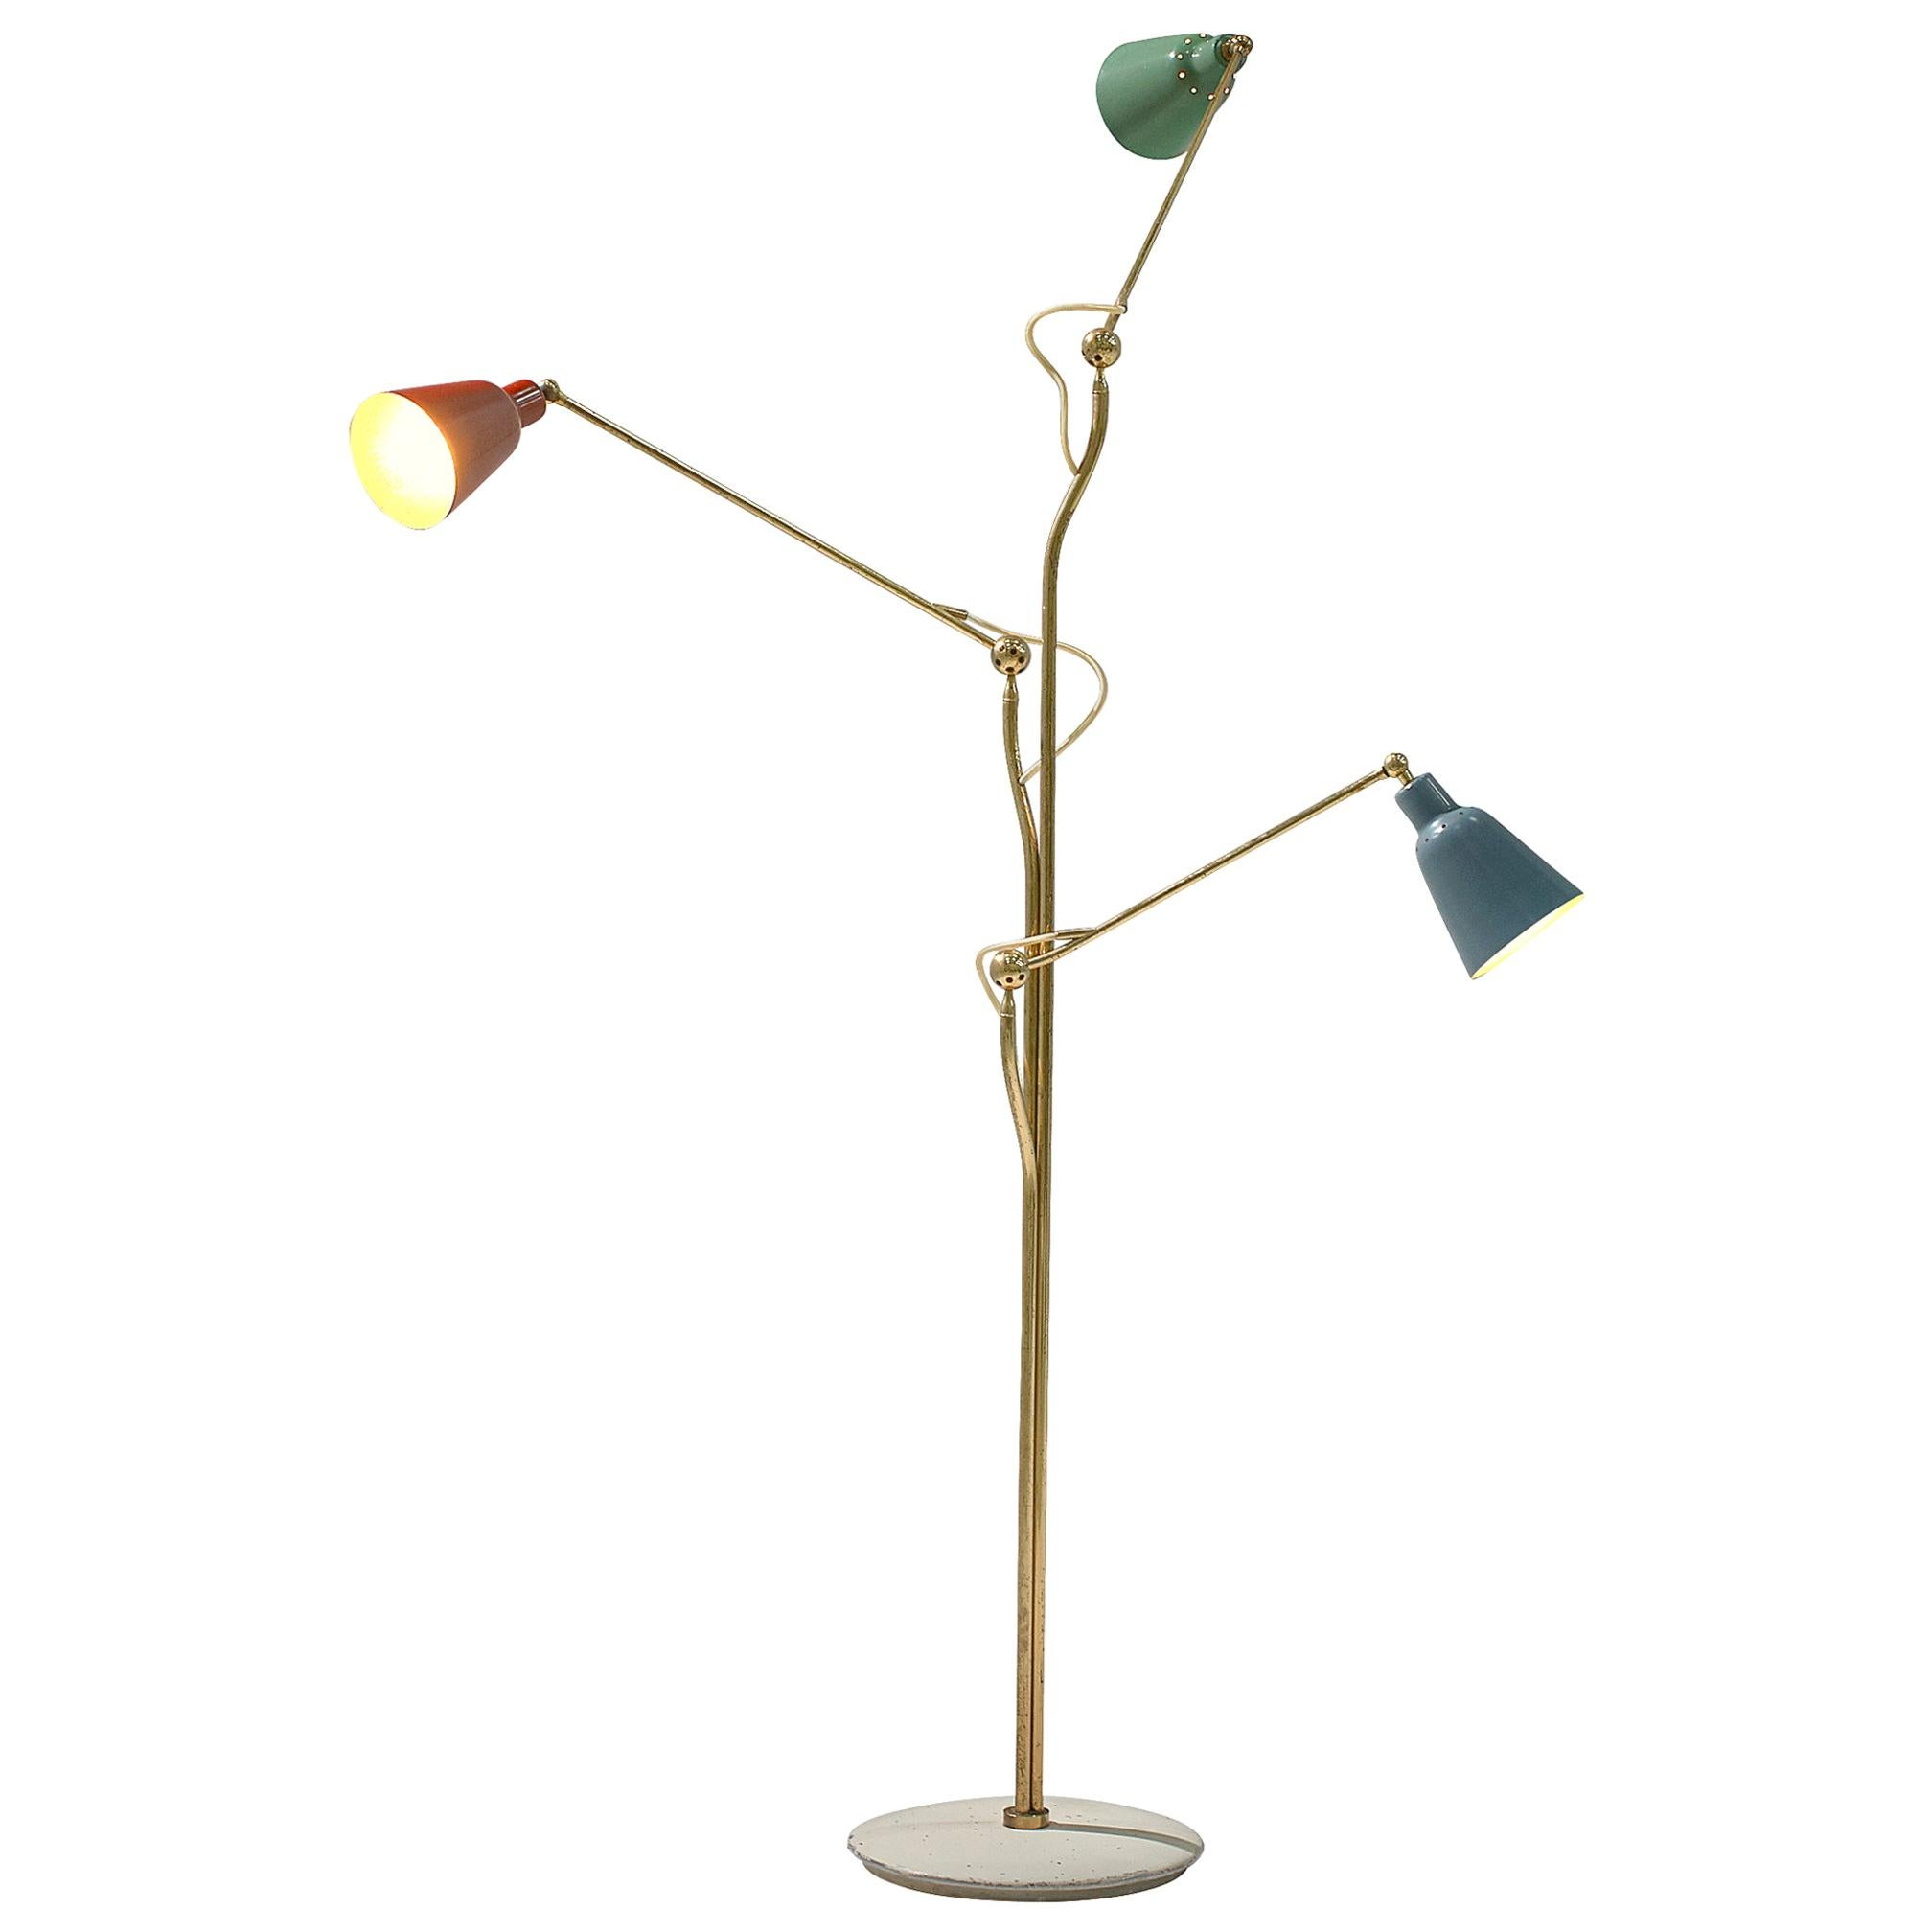 Three-Armed Floor Lamp by Angelo Lelii for Arredoluce